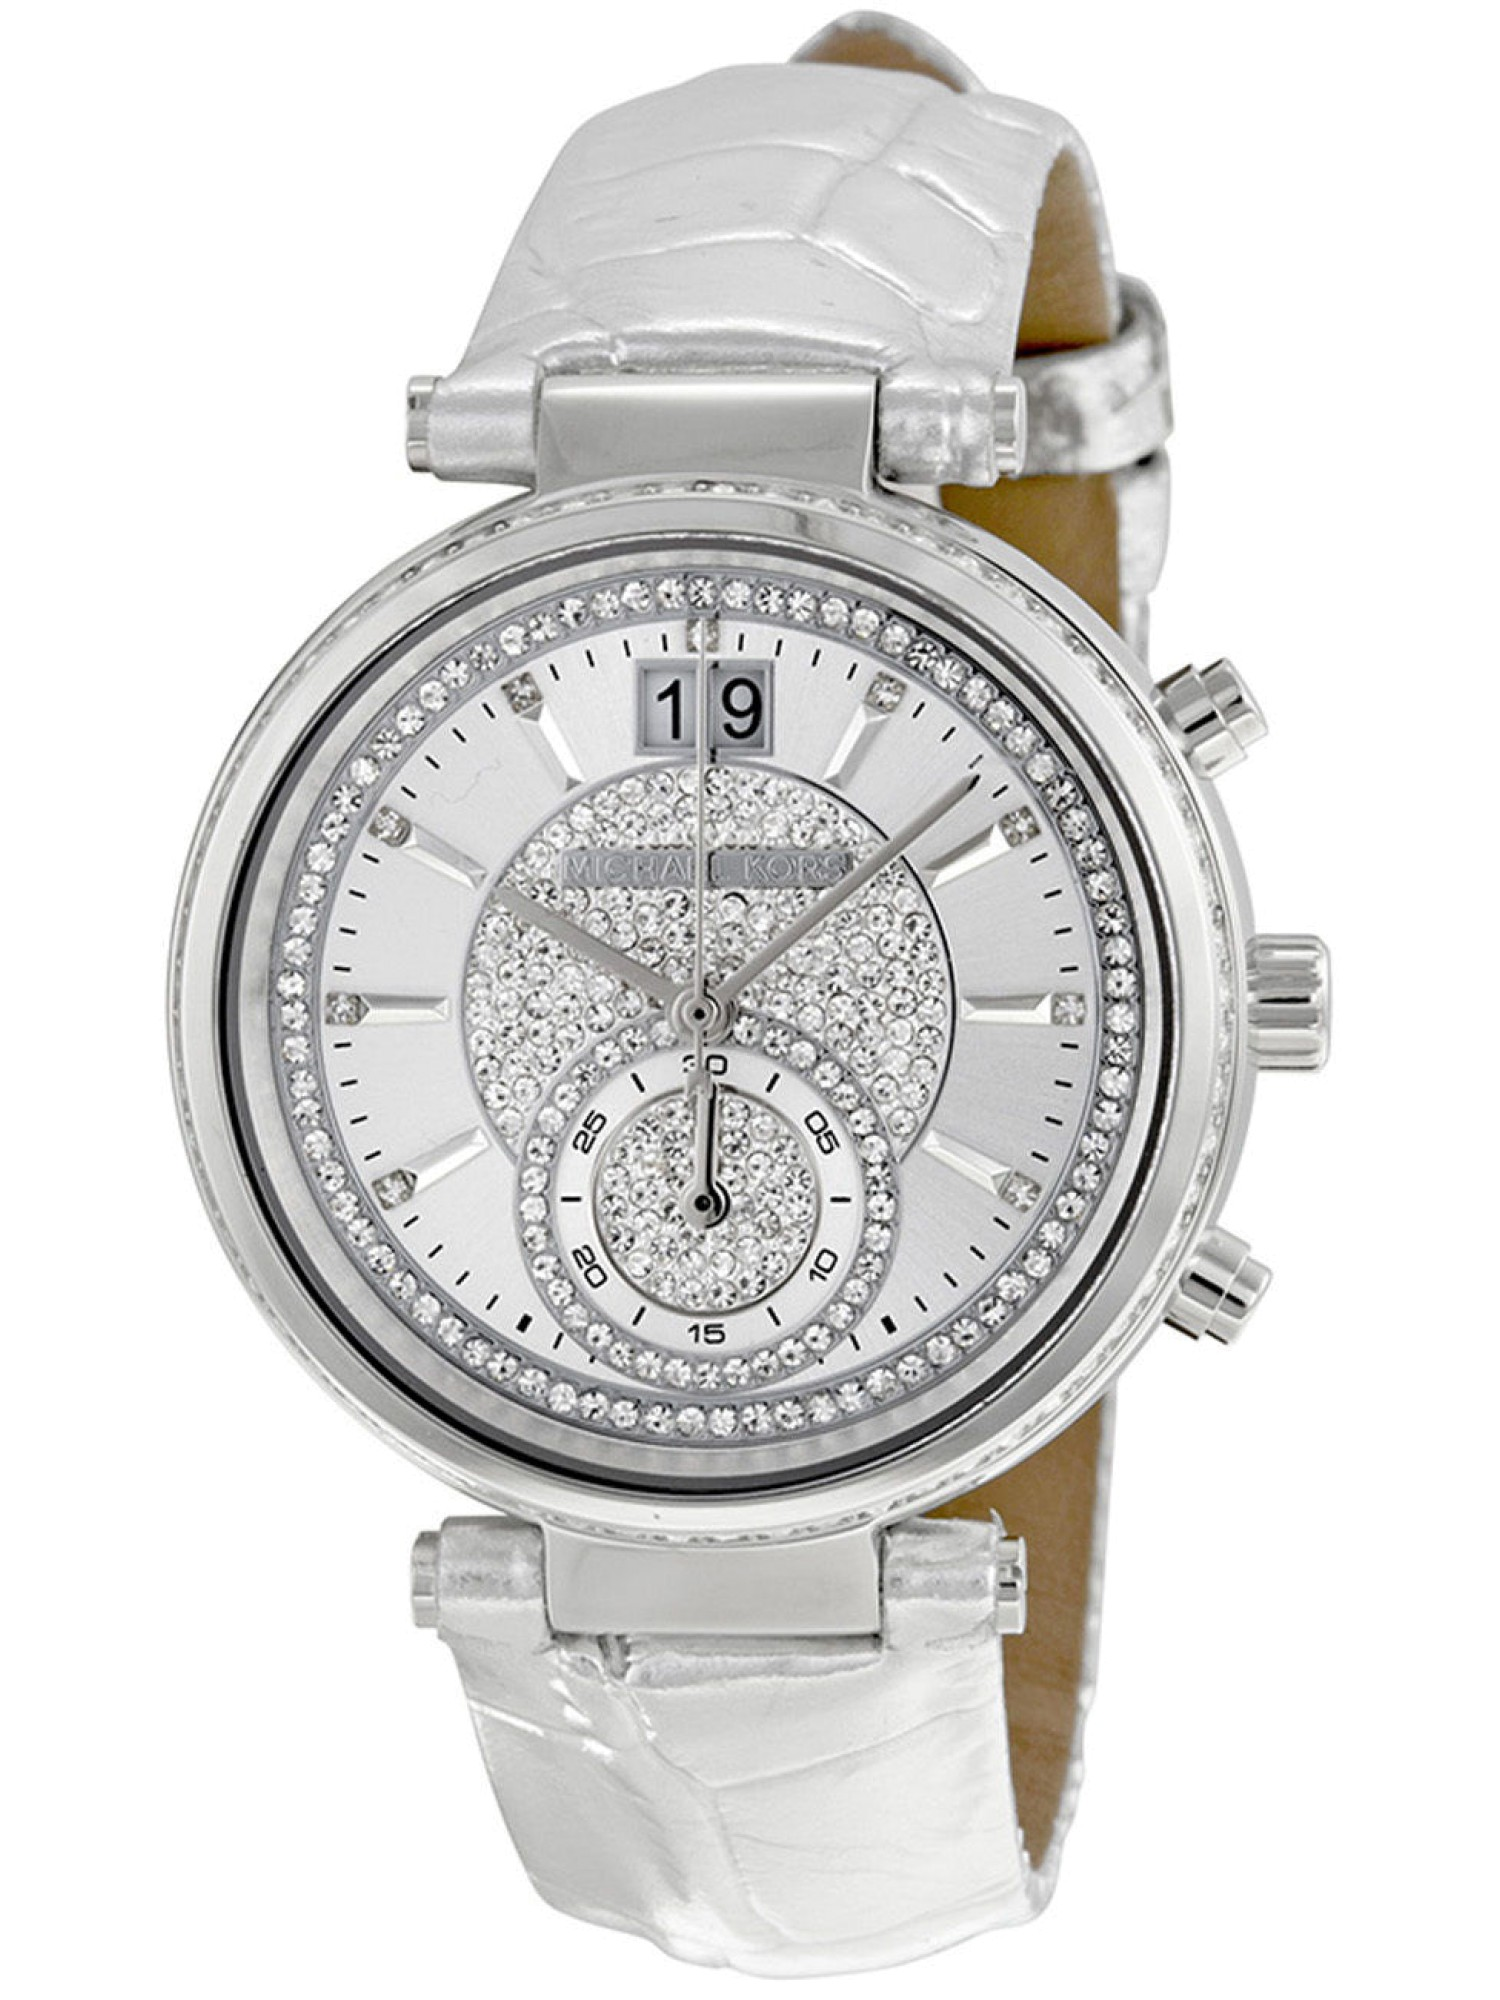 fee2cbd99 Michael Kors - Michael Kors Womens MK2443 39mm Watch 172268452961-E ...